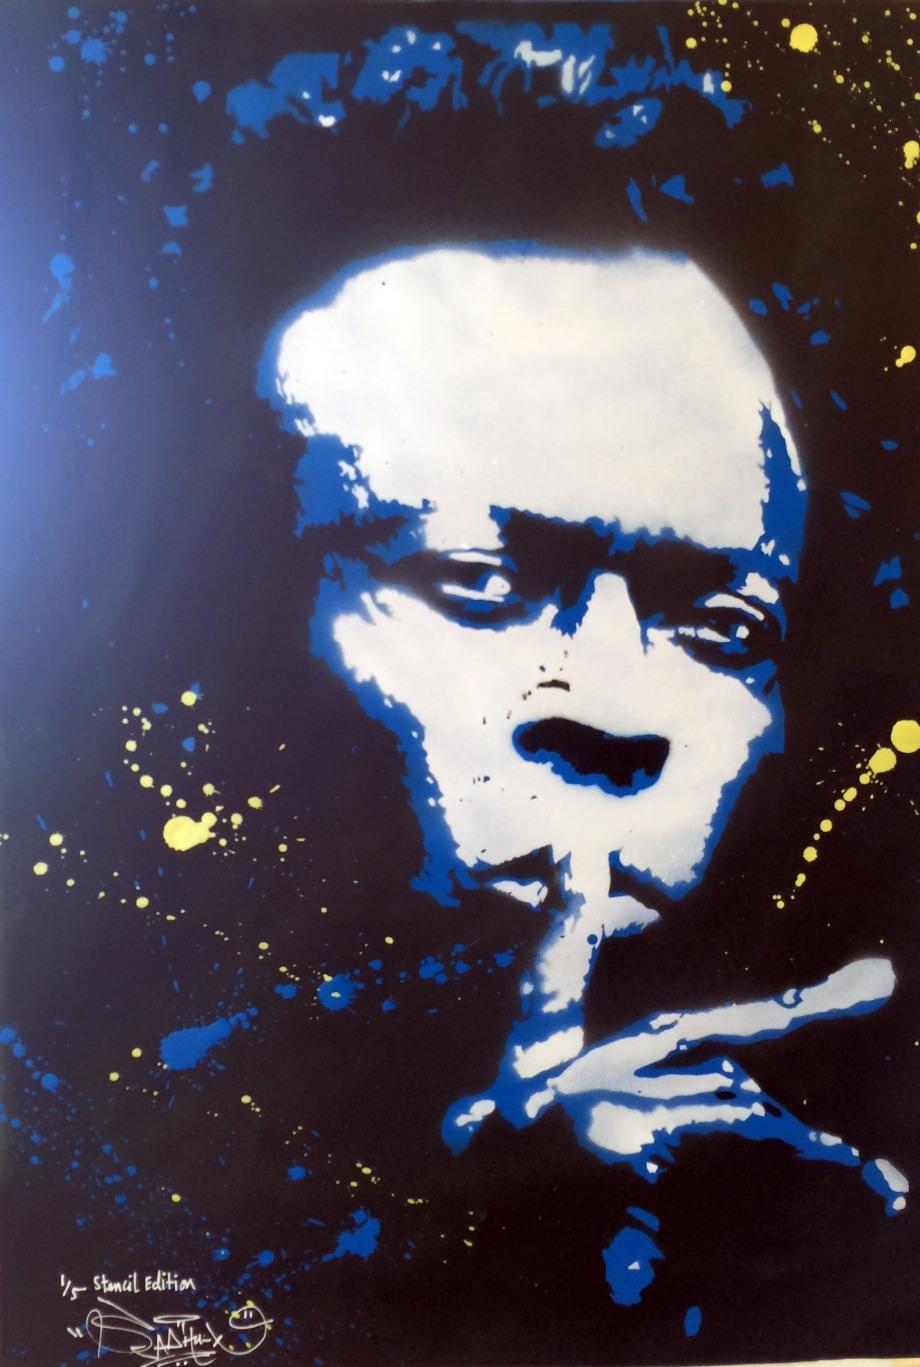 Works Miles Davis Shhh